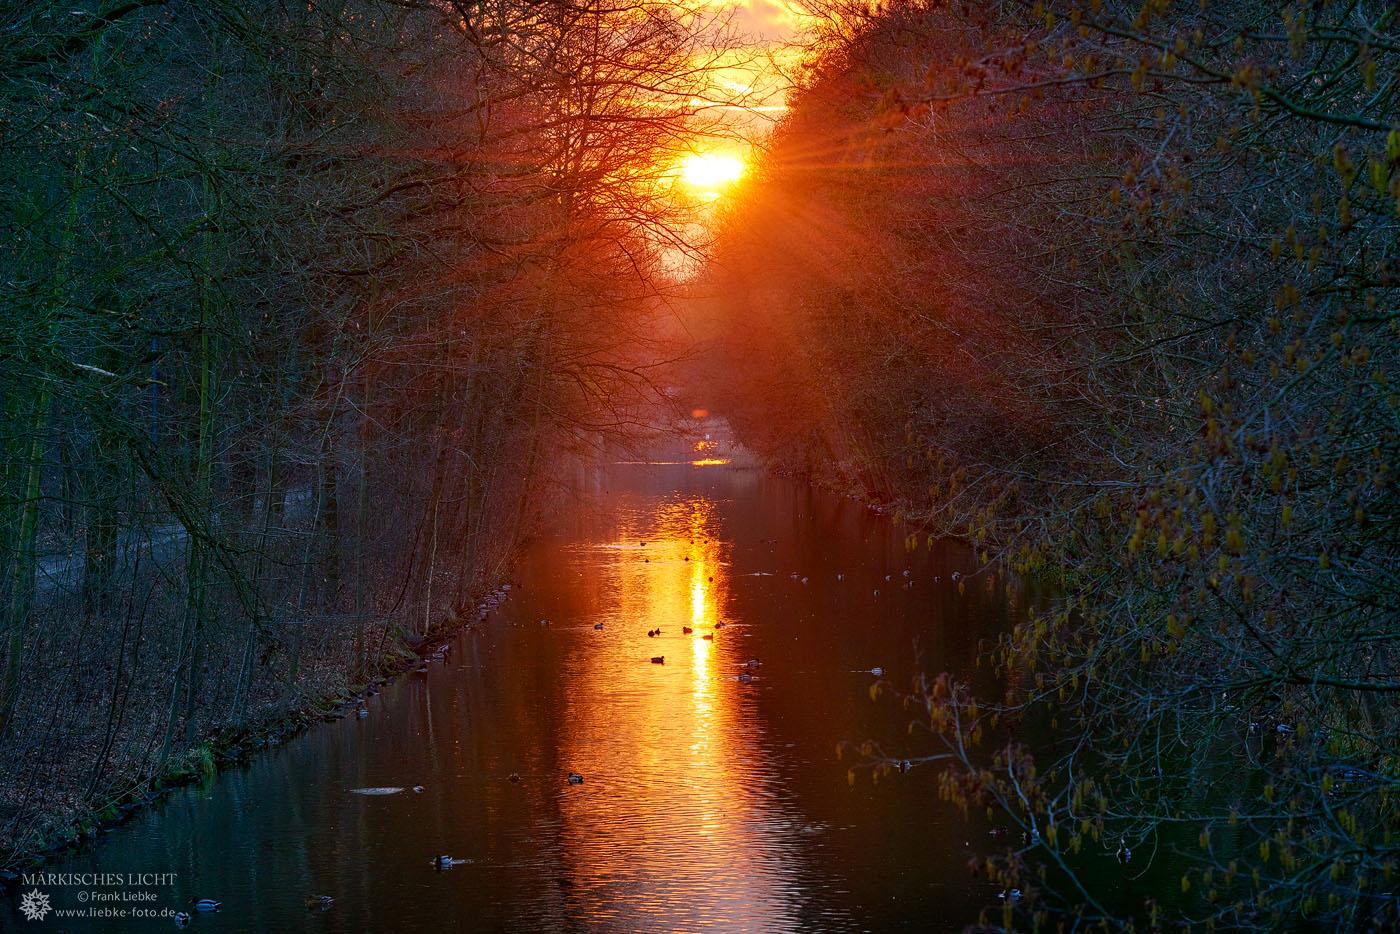 Notte-Kanal Königs Wusterhausen